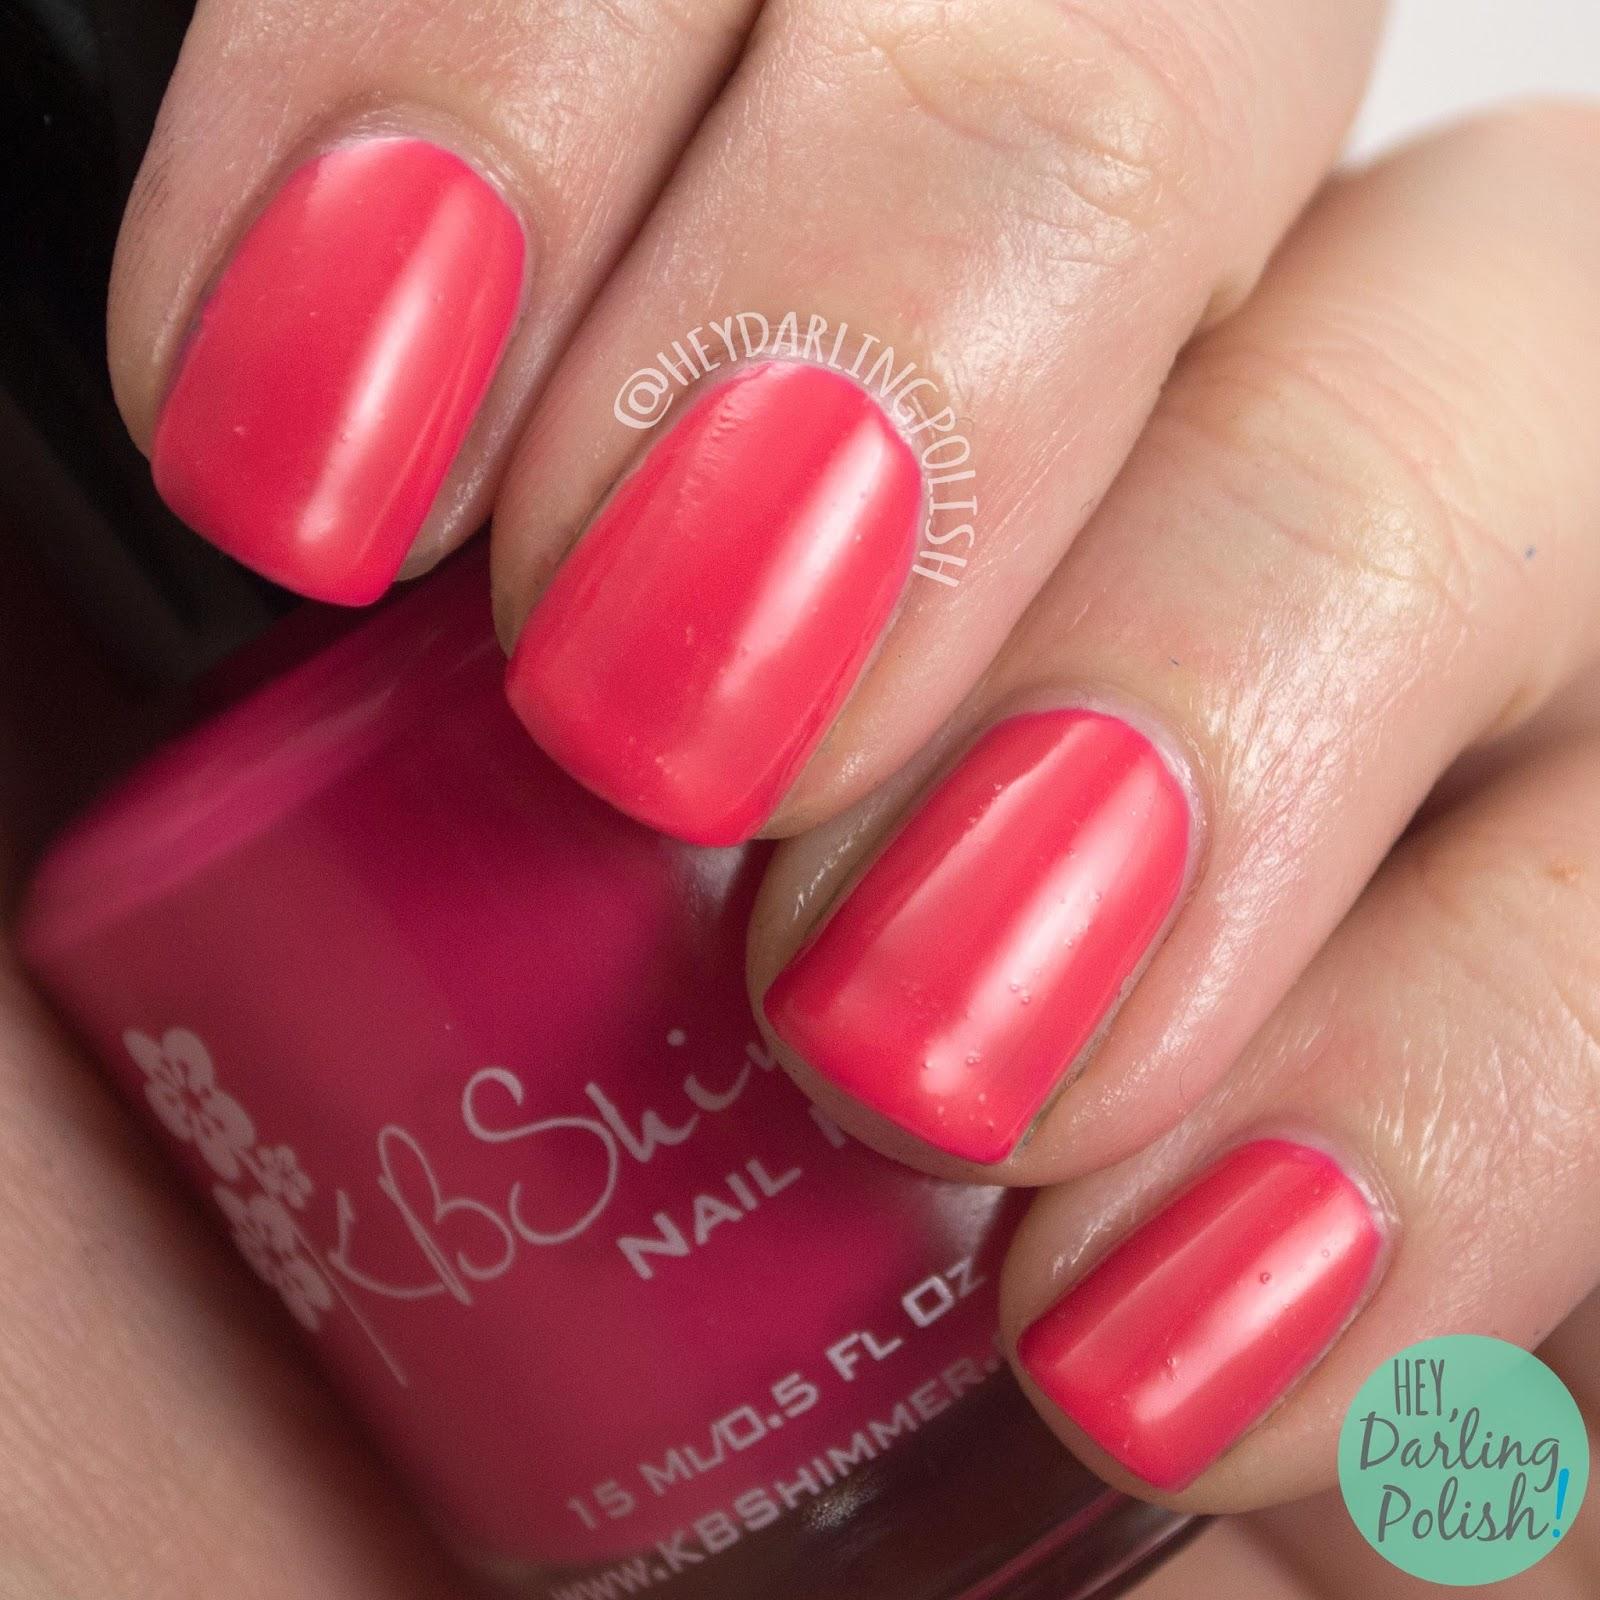 nails, nail polish, kbshimmer, pink, indie polish, let's not coral, creme, swatch